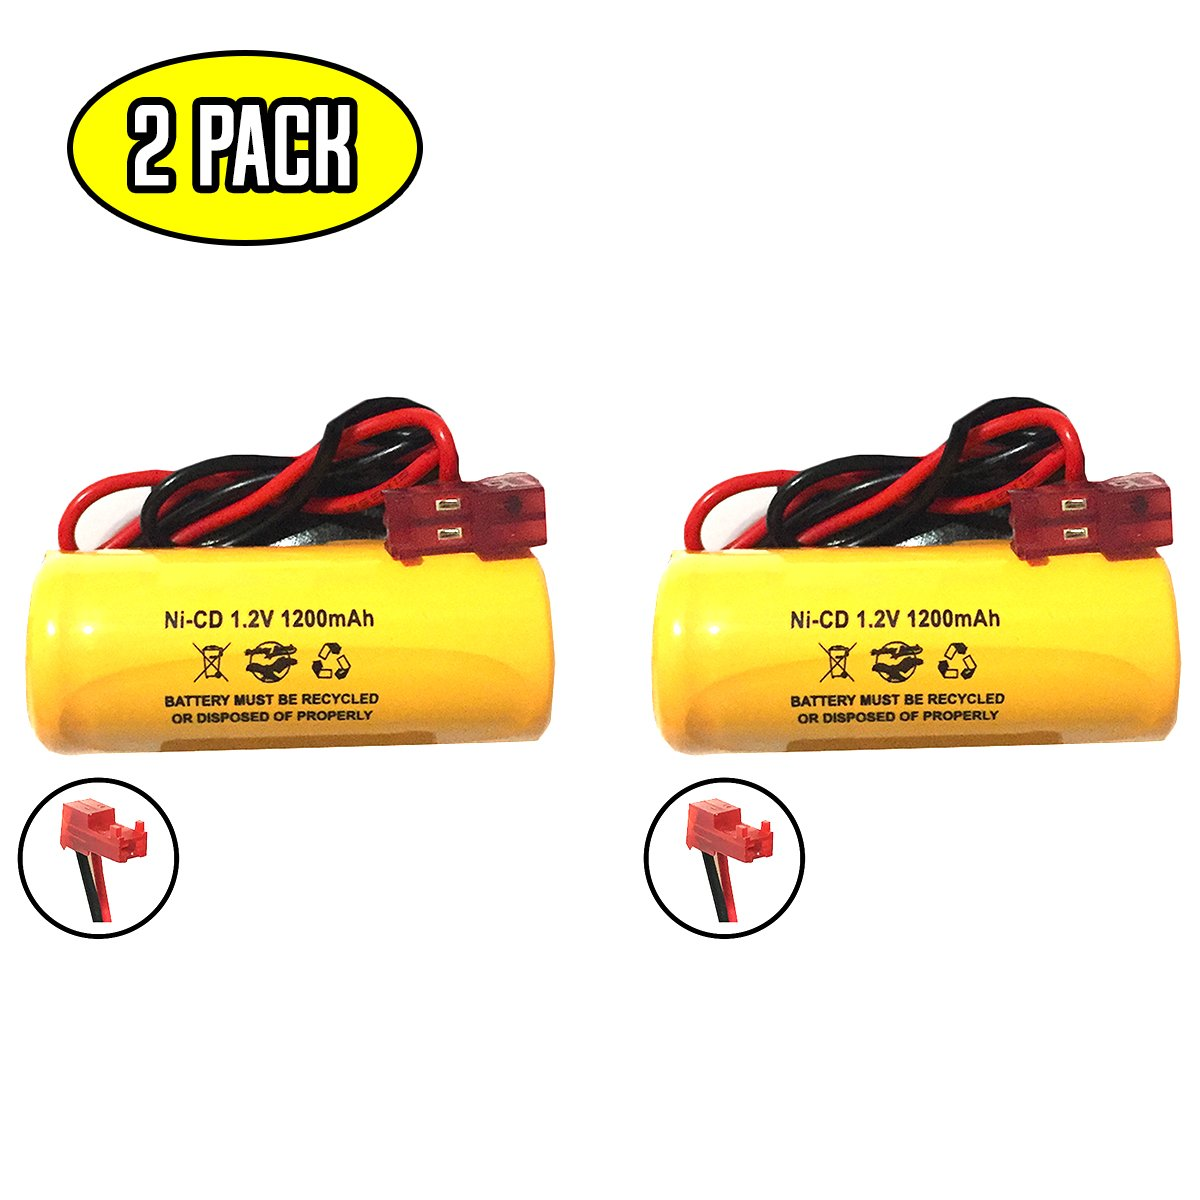 elb1p201n2 1.2v 1000mah Battery Exit Sign Emergency Light Lithonia 1.2v 1200mah ELB1P2901N ANIC1493 ELB0320 NiCad Battery